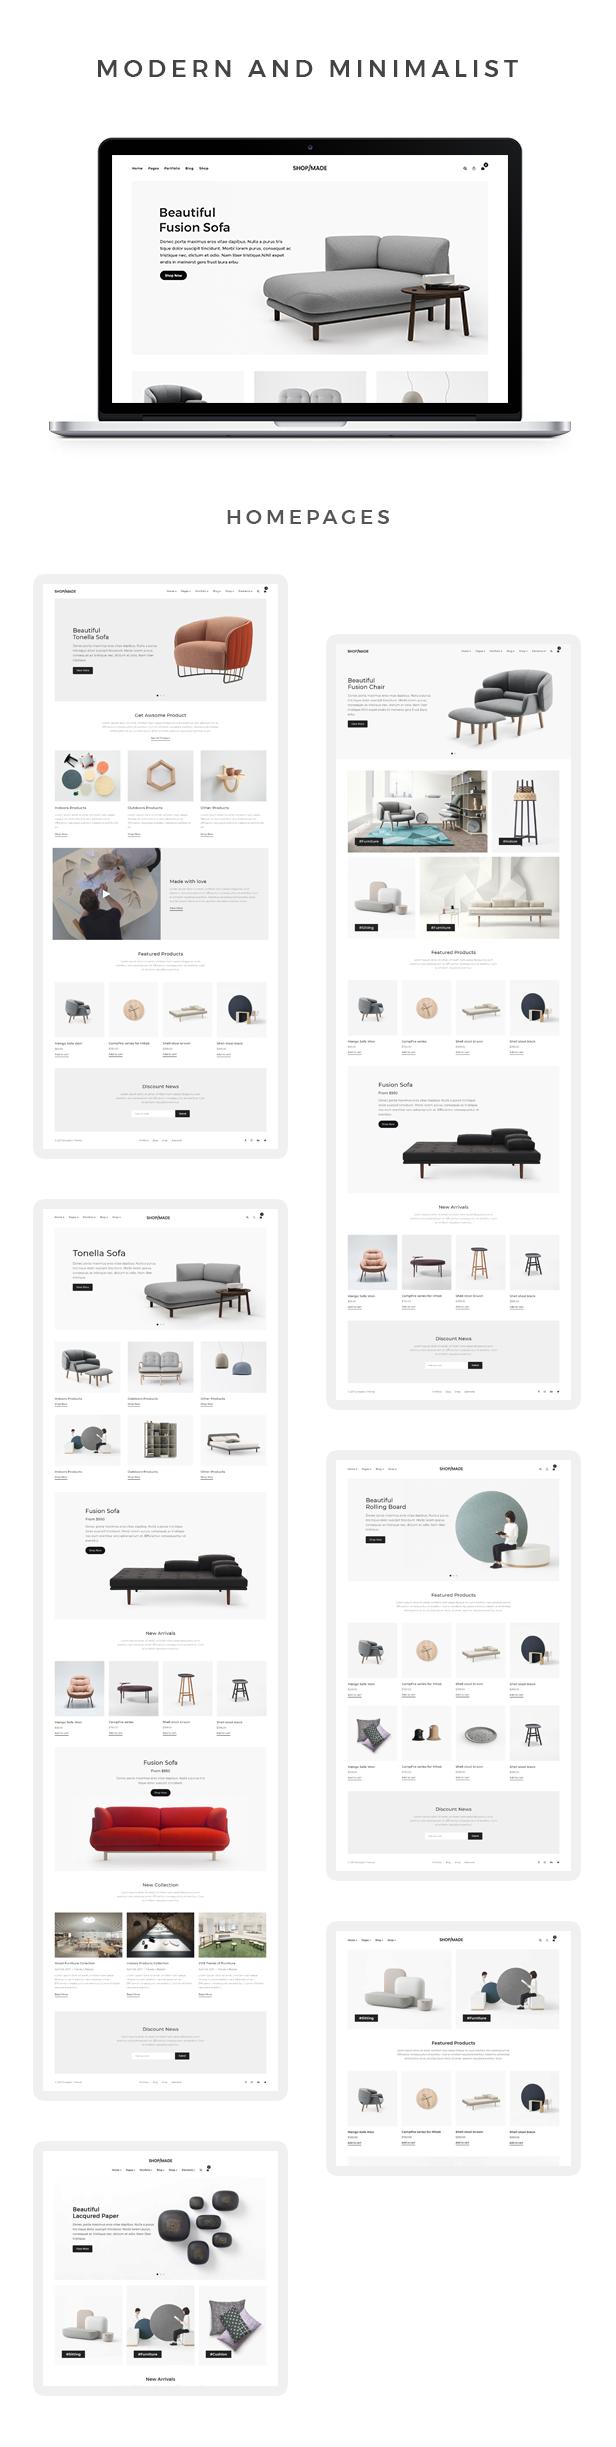 Dukandari - A Modern, Minimalist eCommerce Theme 4